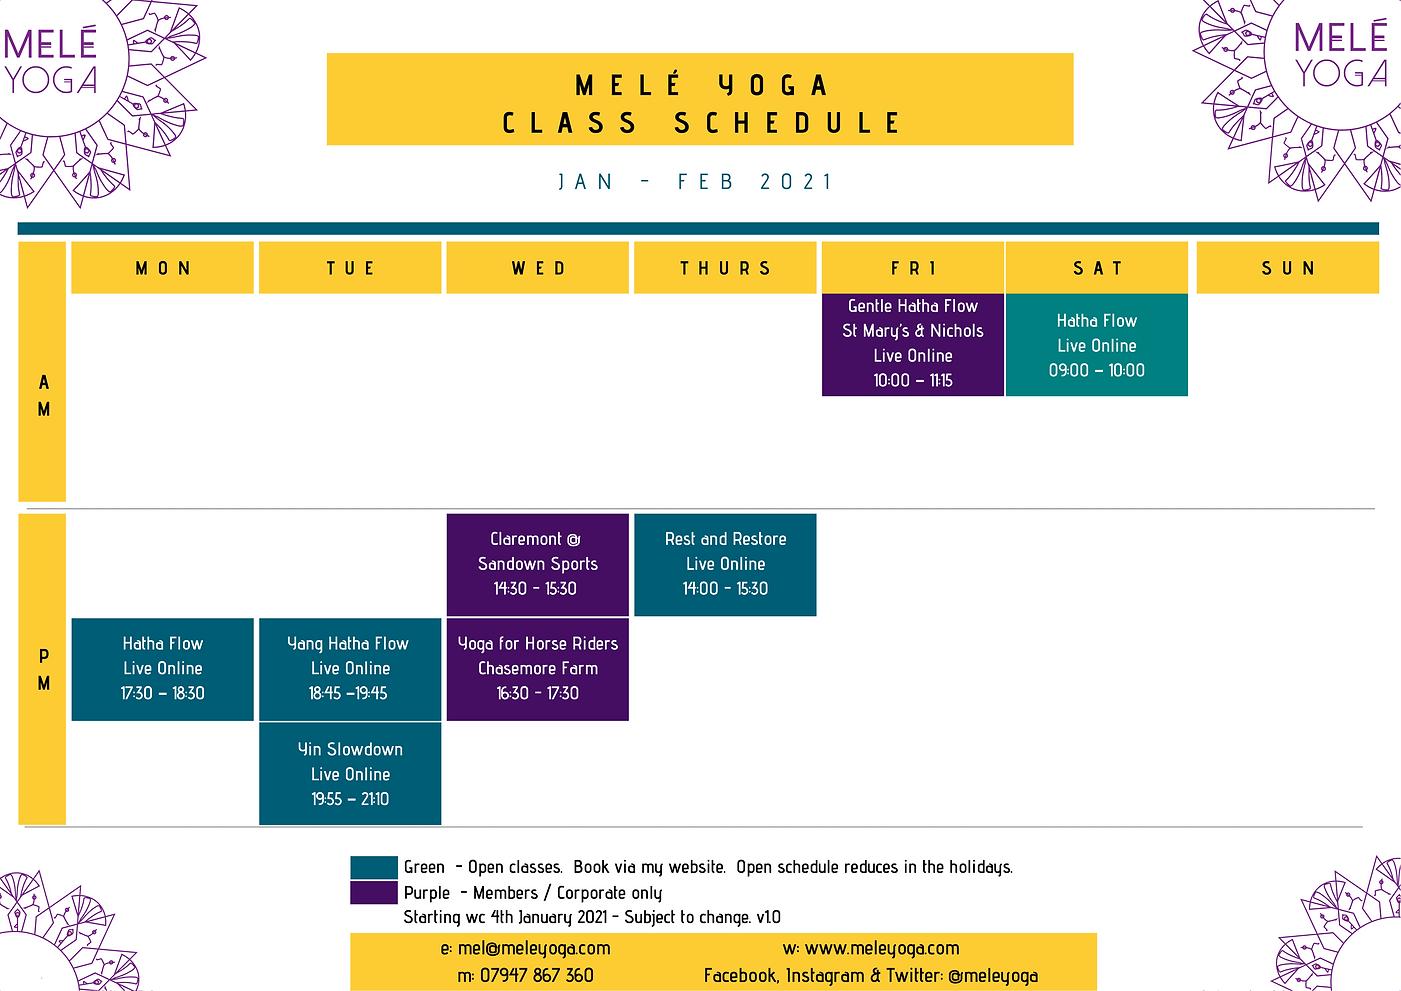 Melé Yoga Jan - Feb 2021 Class Schedule